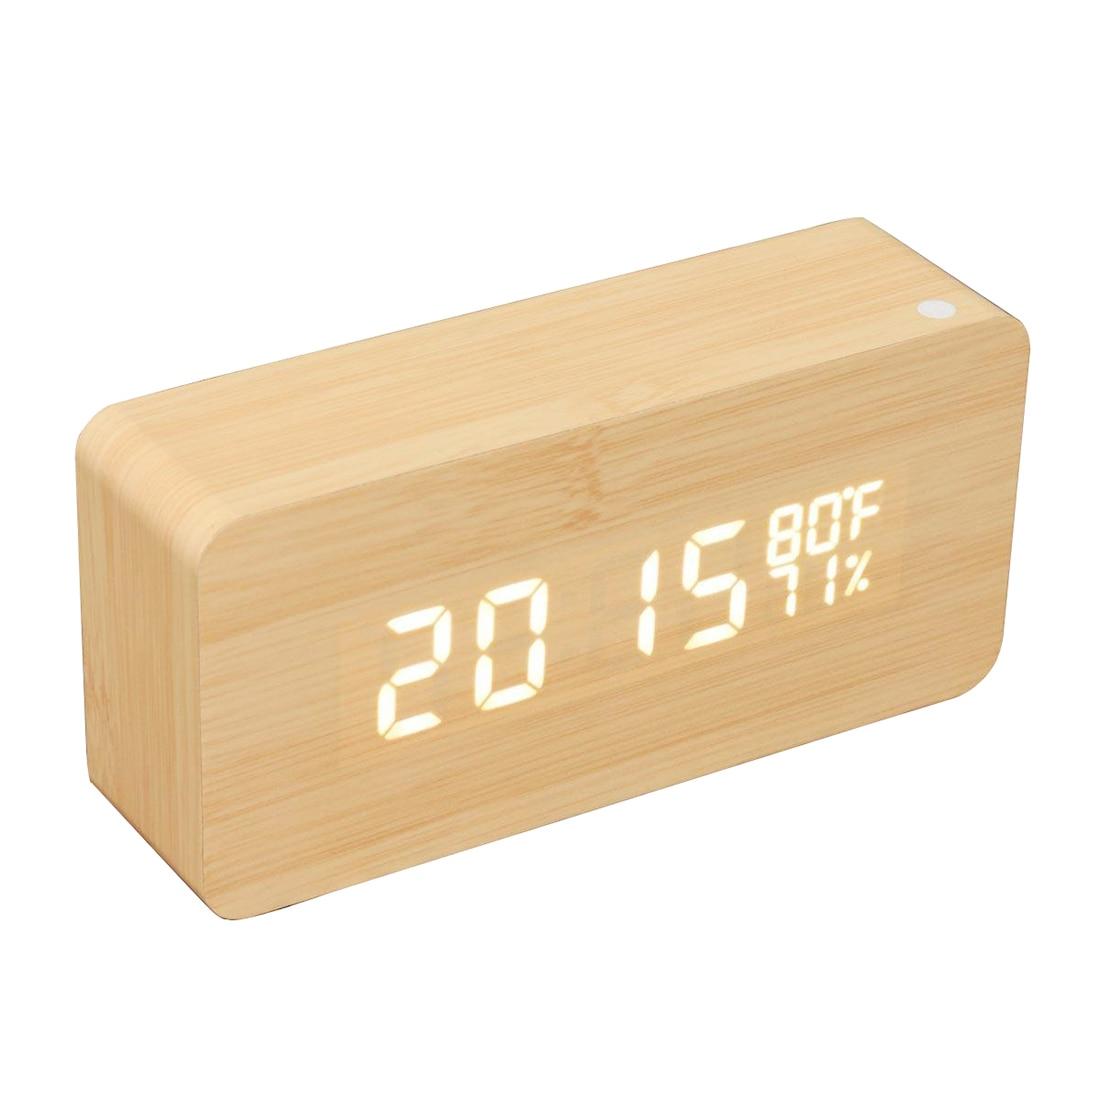 Wooden Alarm Clock Voice Control Time / Temperature / Humidity / Calendar Adjustable Brightness Battery / USB Socket Decoration